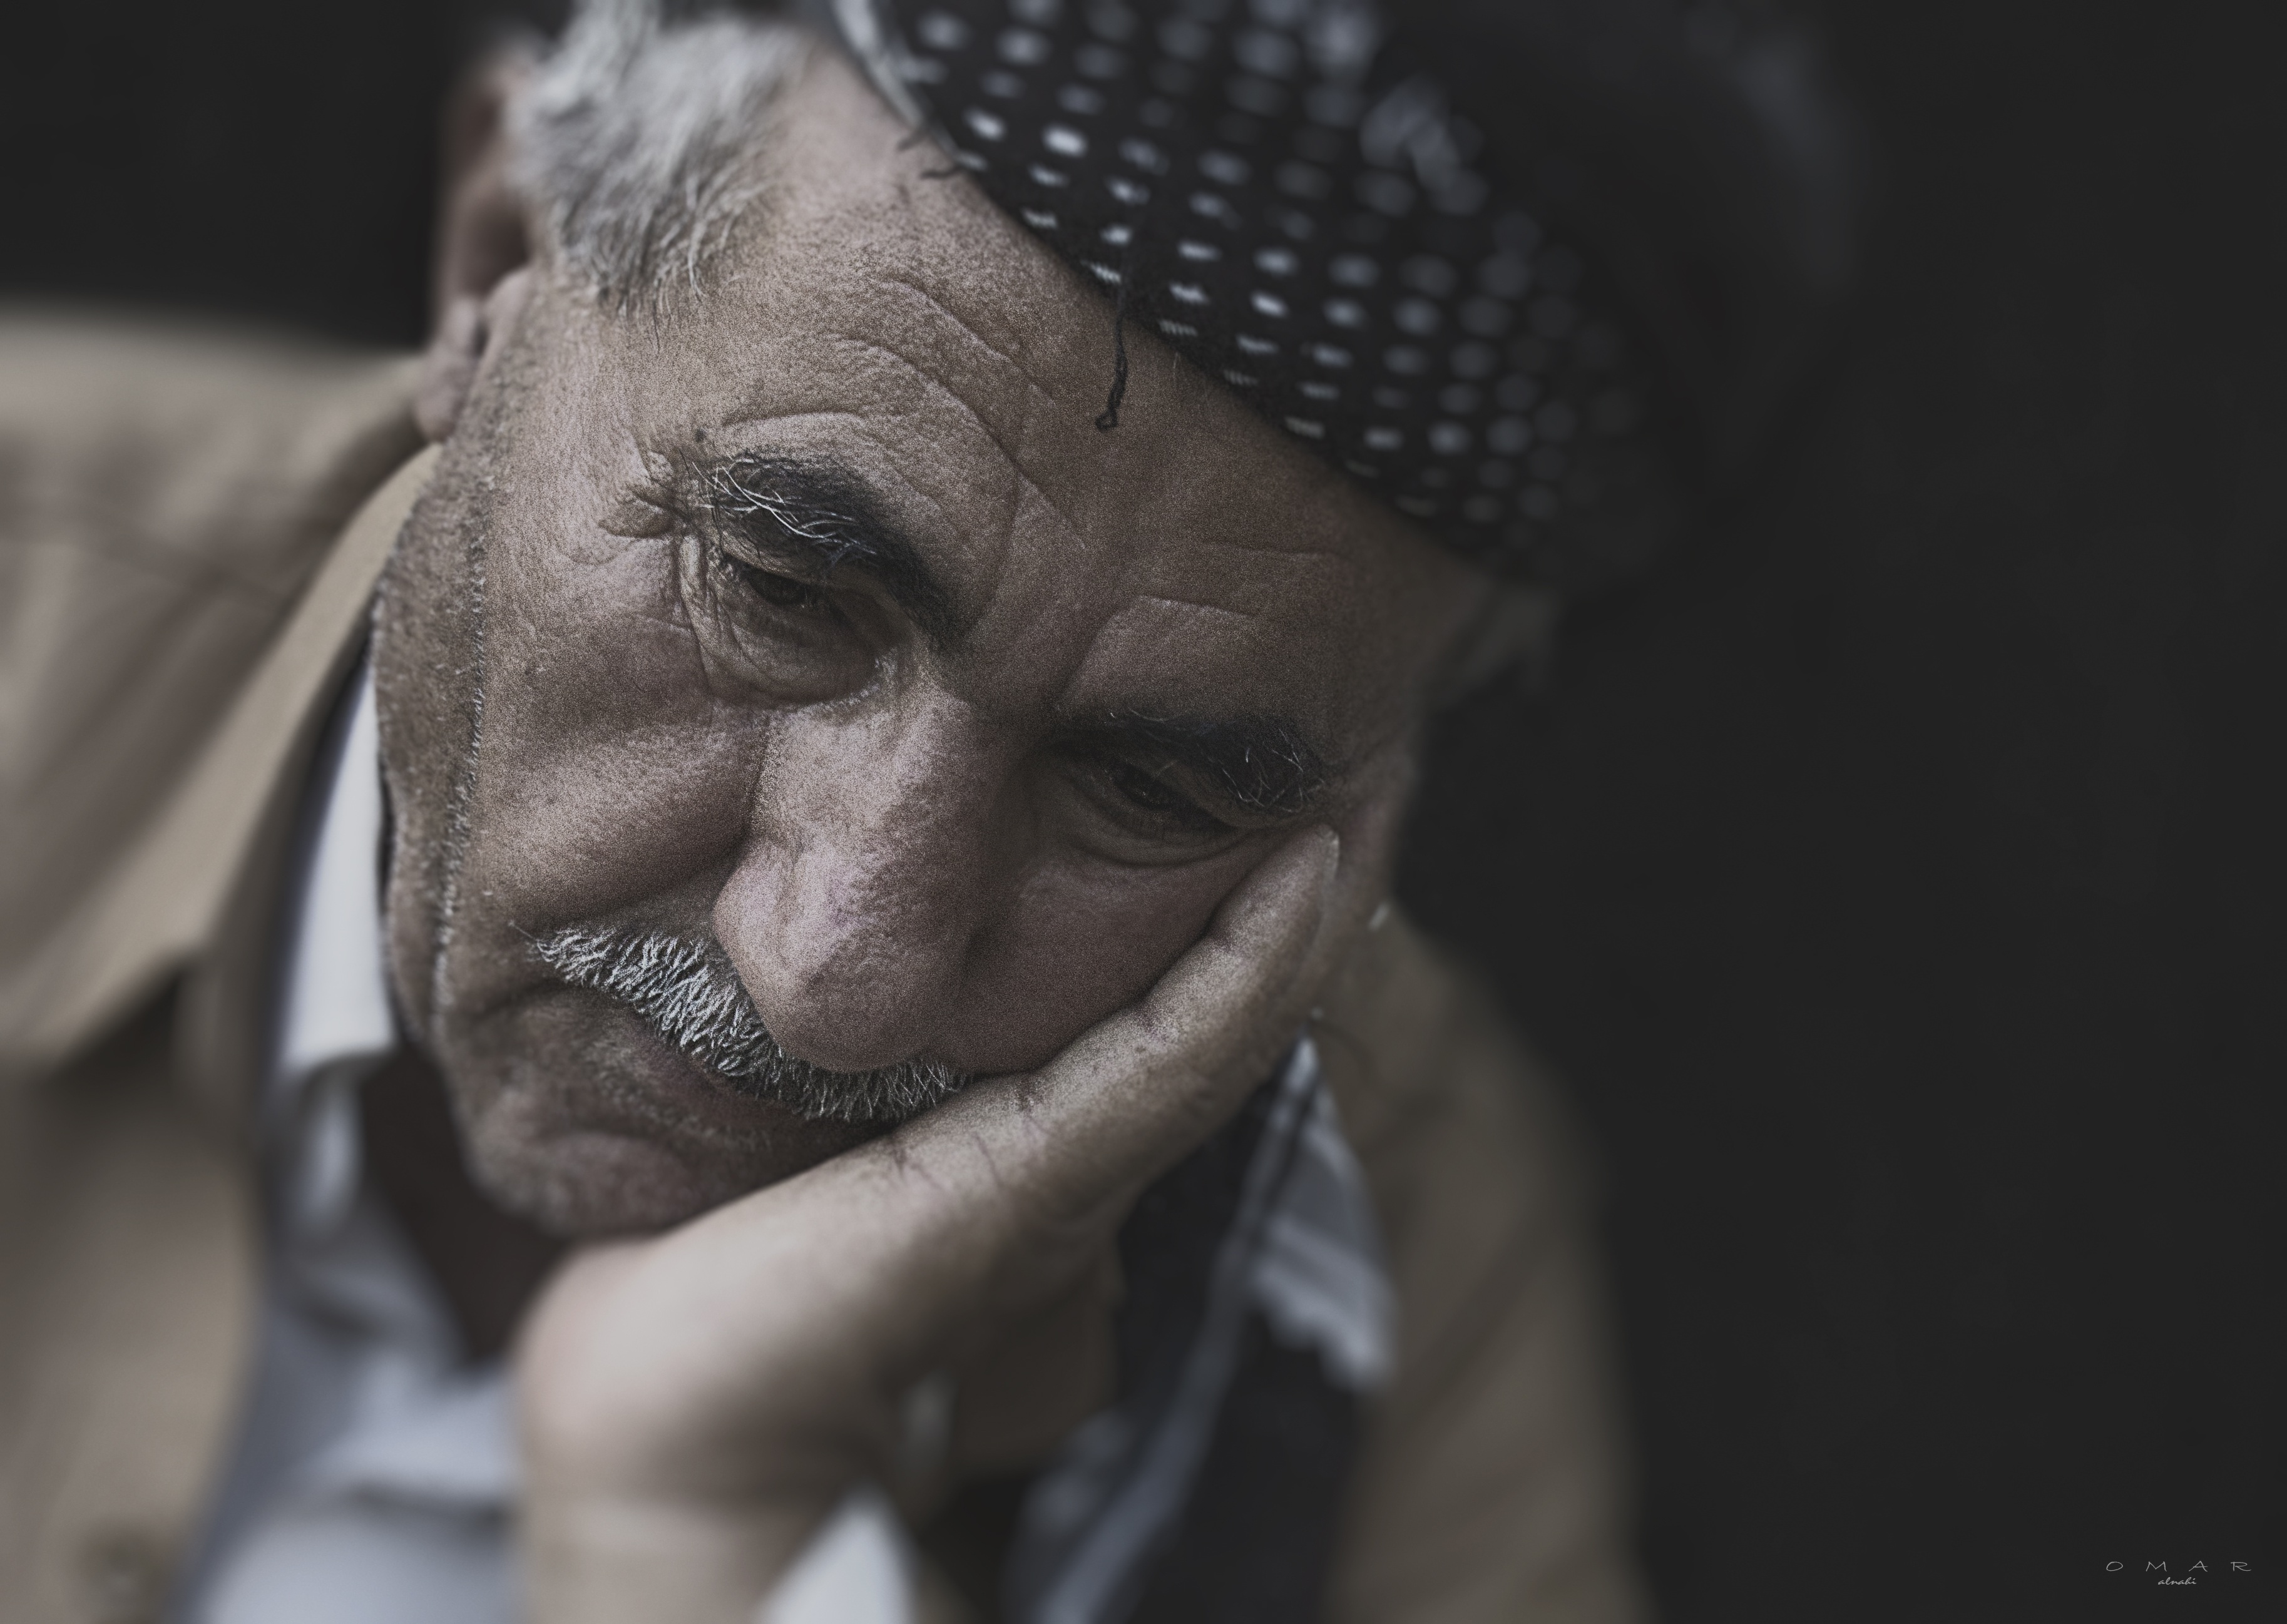 Elderly man resting his head in his hand, looking forlorn.